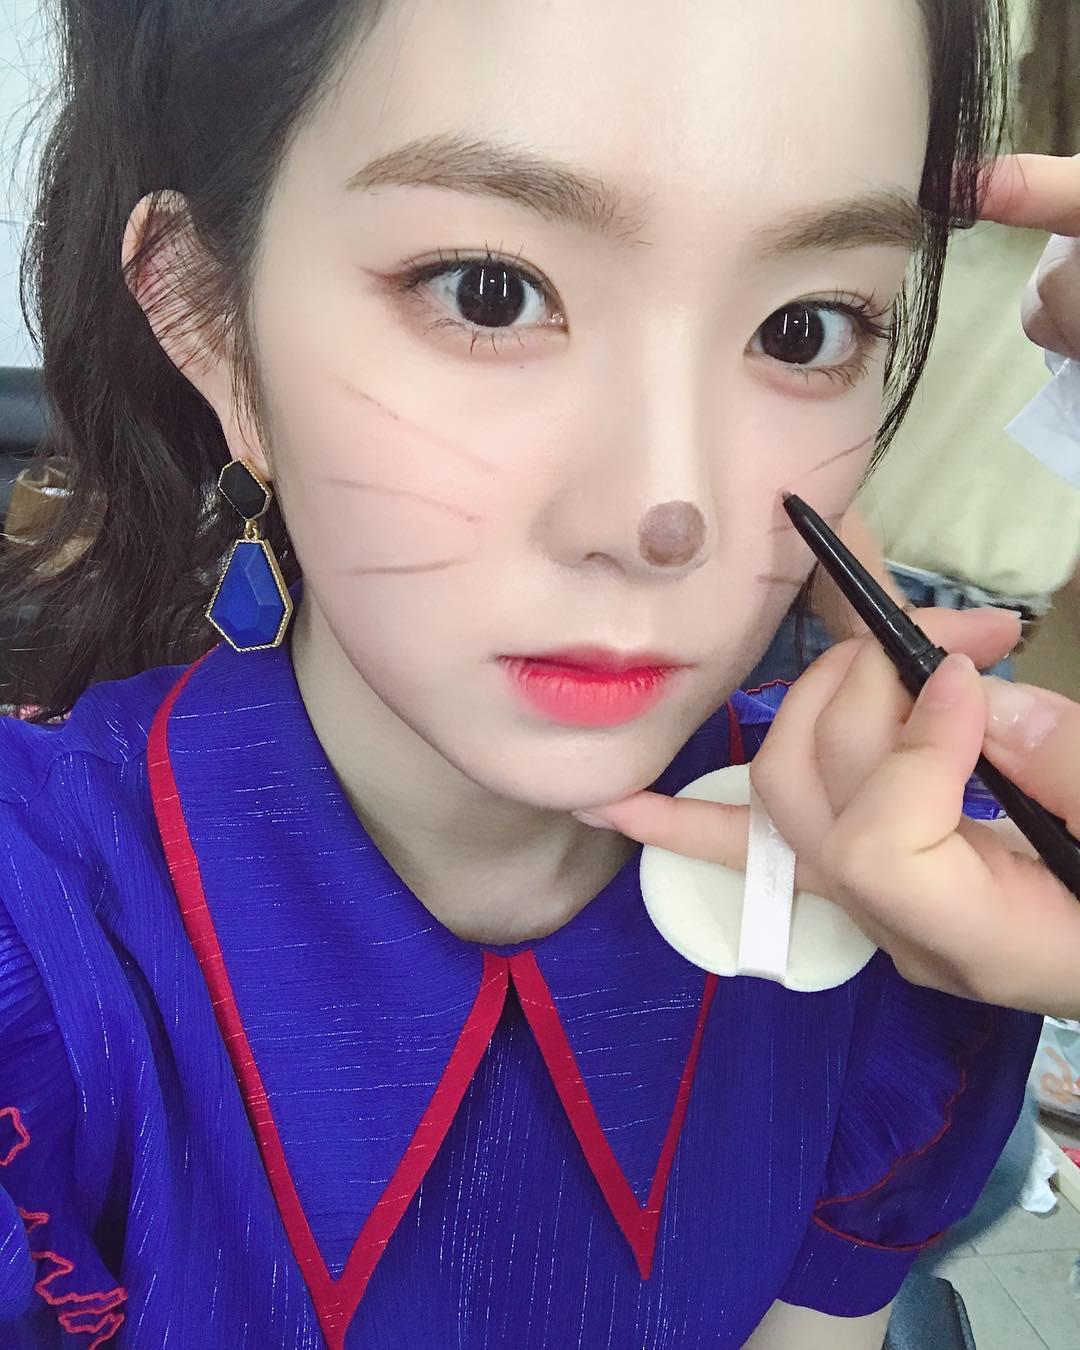 # Red Velvet - Irene Irene早在出道前就以大邱臉讚出名,每次回歸都美到令人窒息啊,Irene更是被韓國網友稱讚是「喚醒早上的美貌 」~